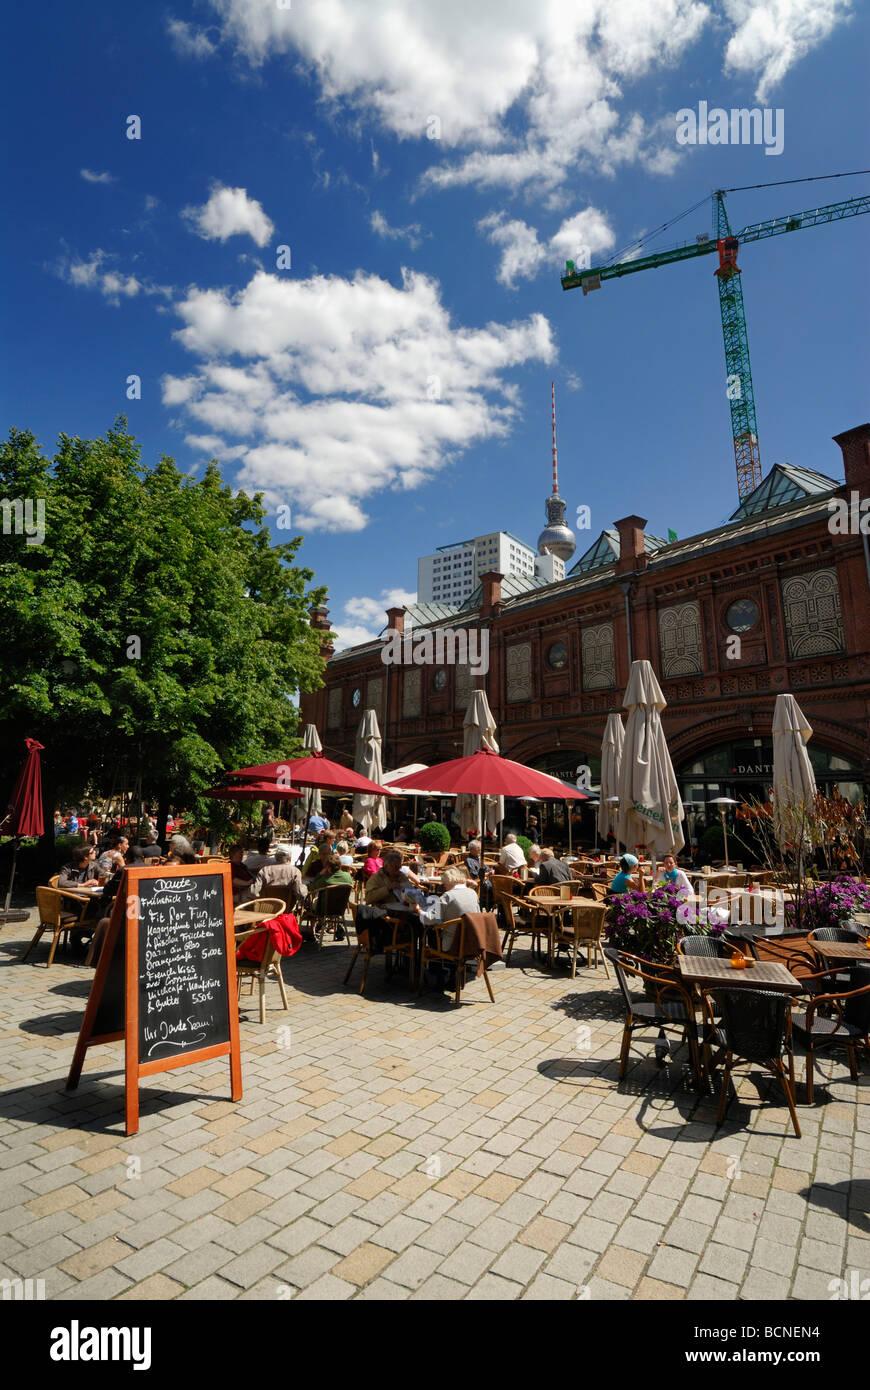 Berlin Germany Open air cafes restaurants at Hackescher Market - Stock Image